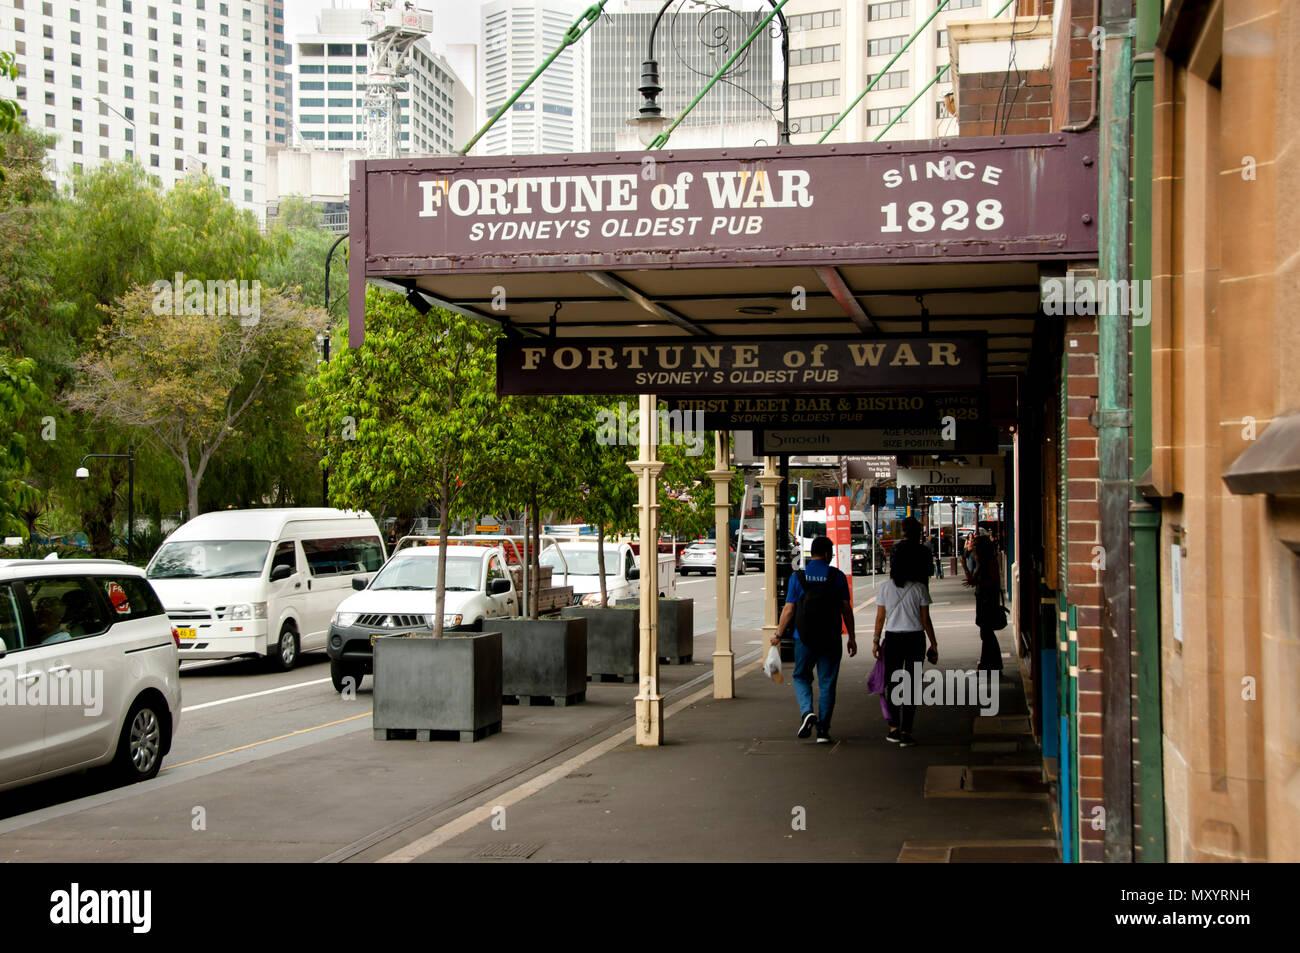 SYDNEY, AUSTRALIEN - 6. April 2018: das Glück des Krieges; Sydneys ältesten Pub Stockbild